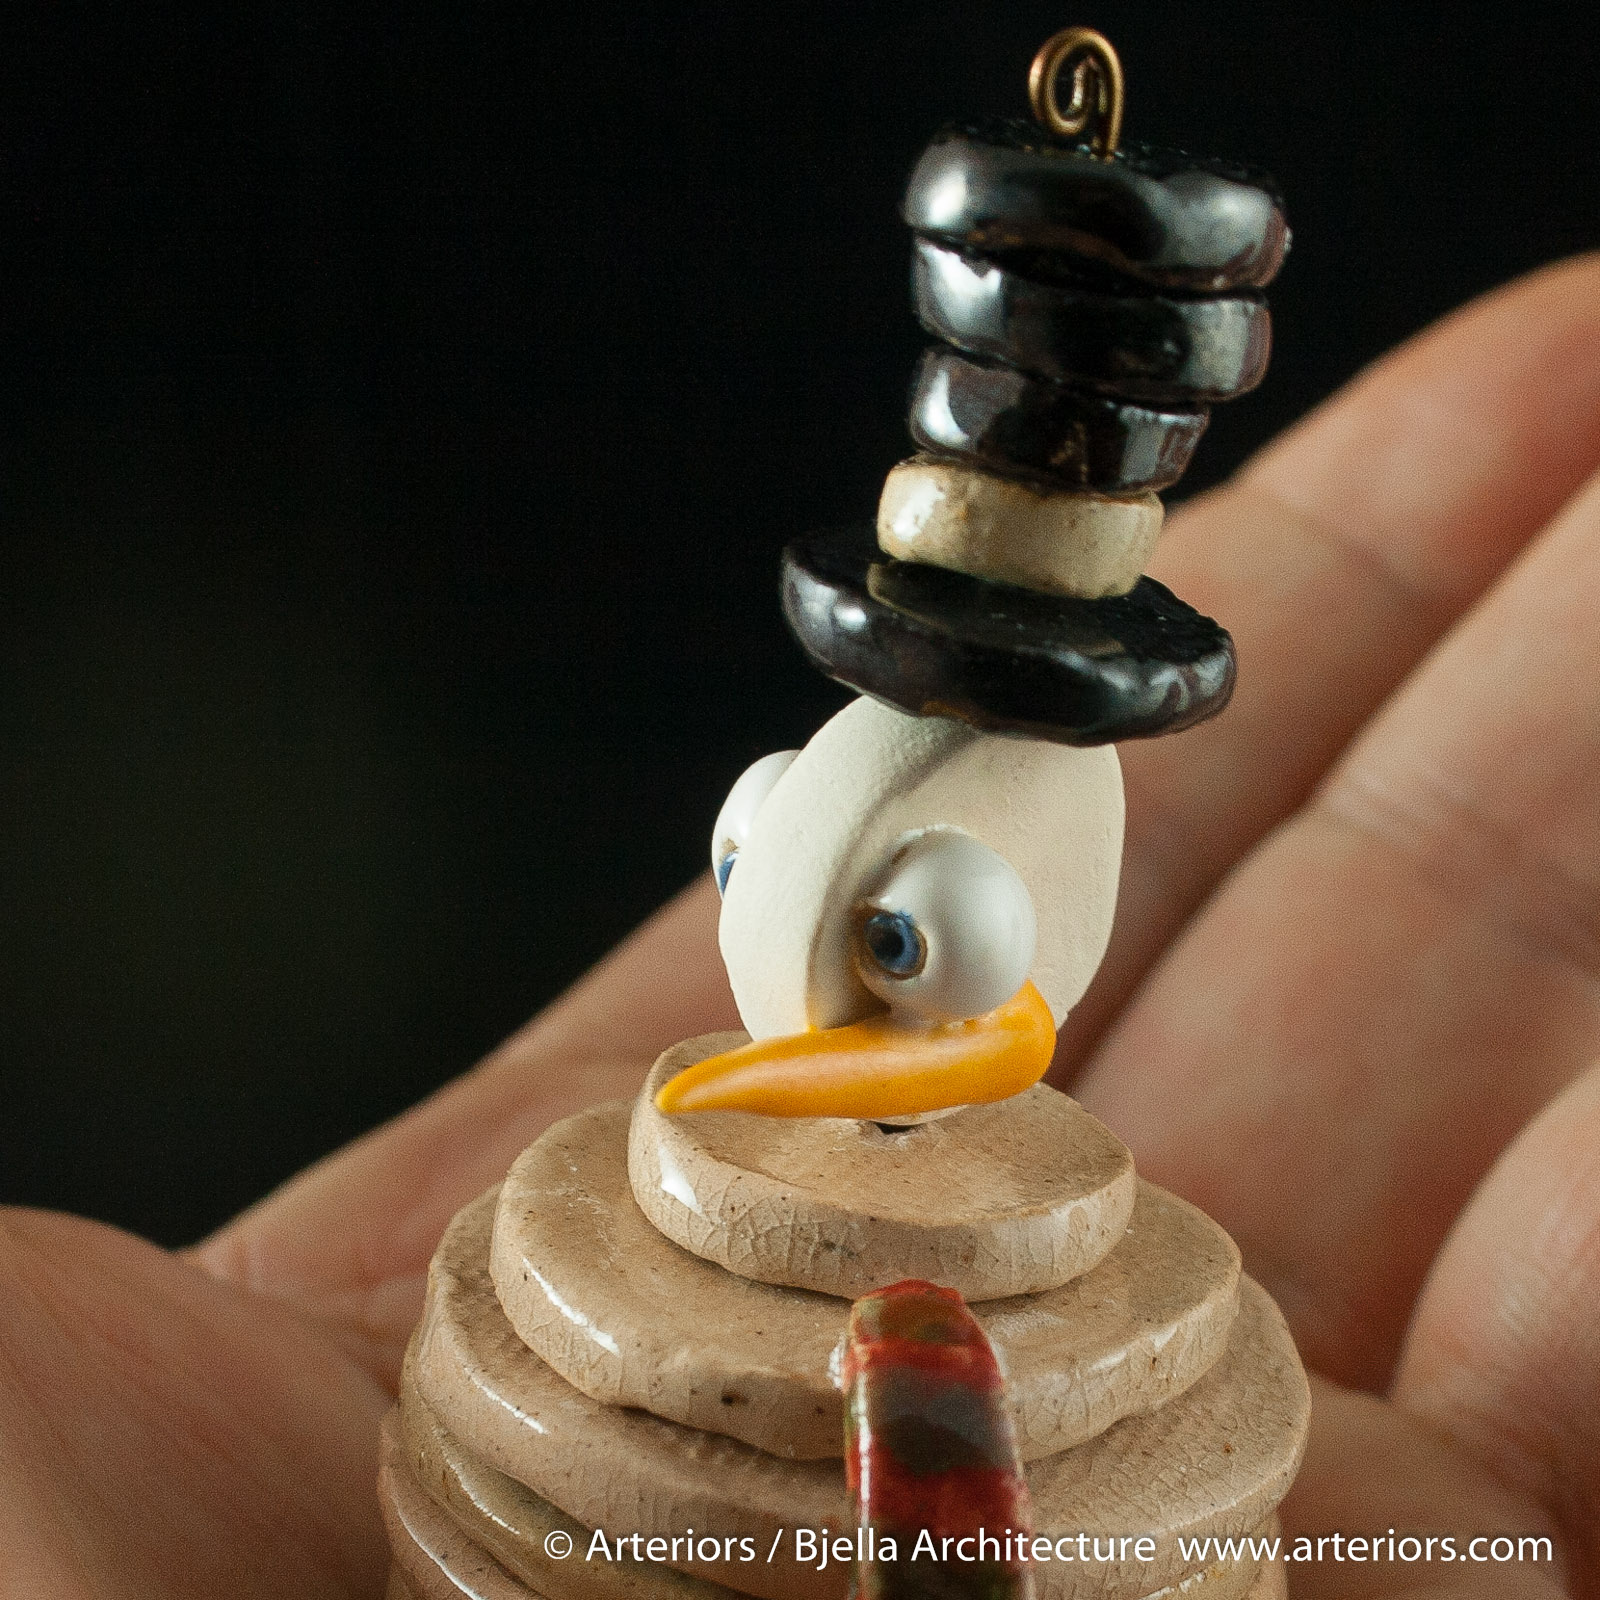 Bjella Snowman Ornament - Day 3 - Disc men-14